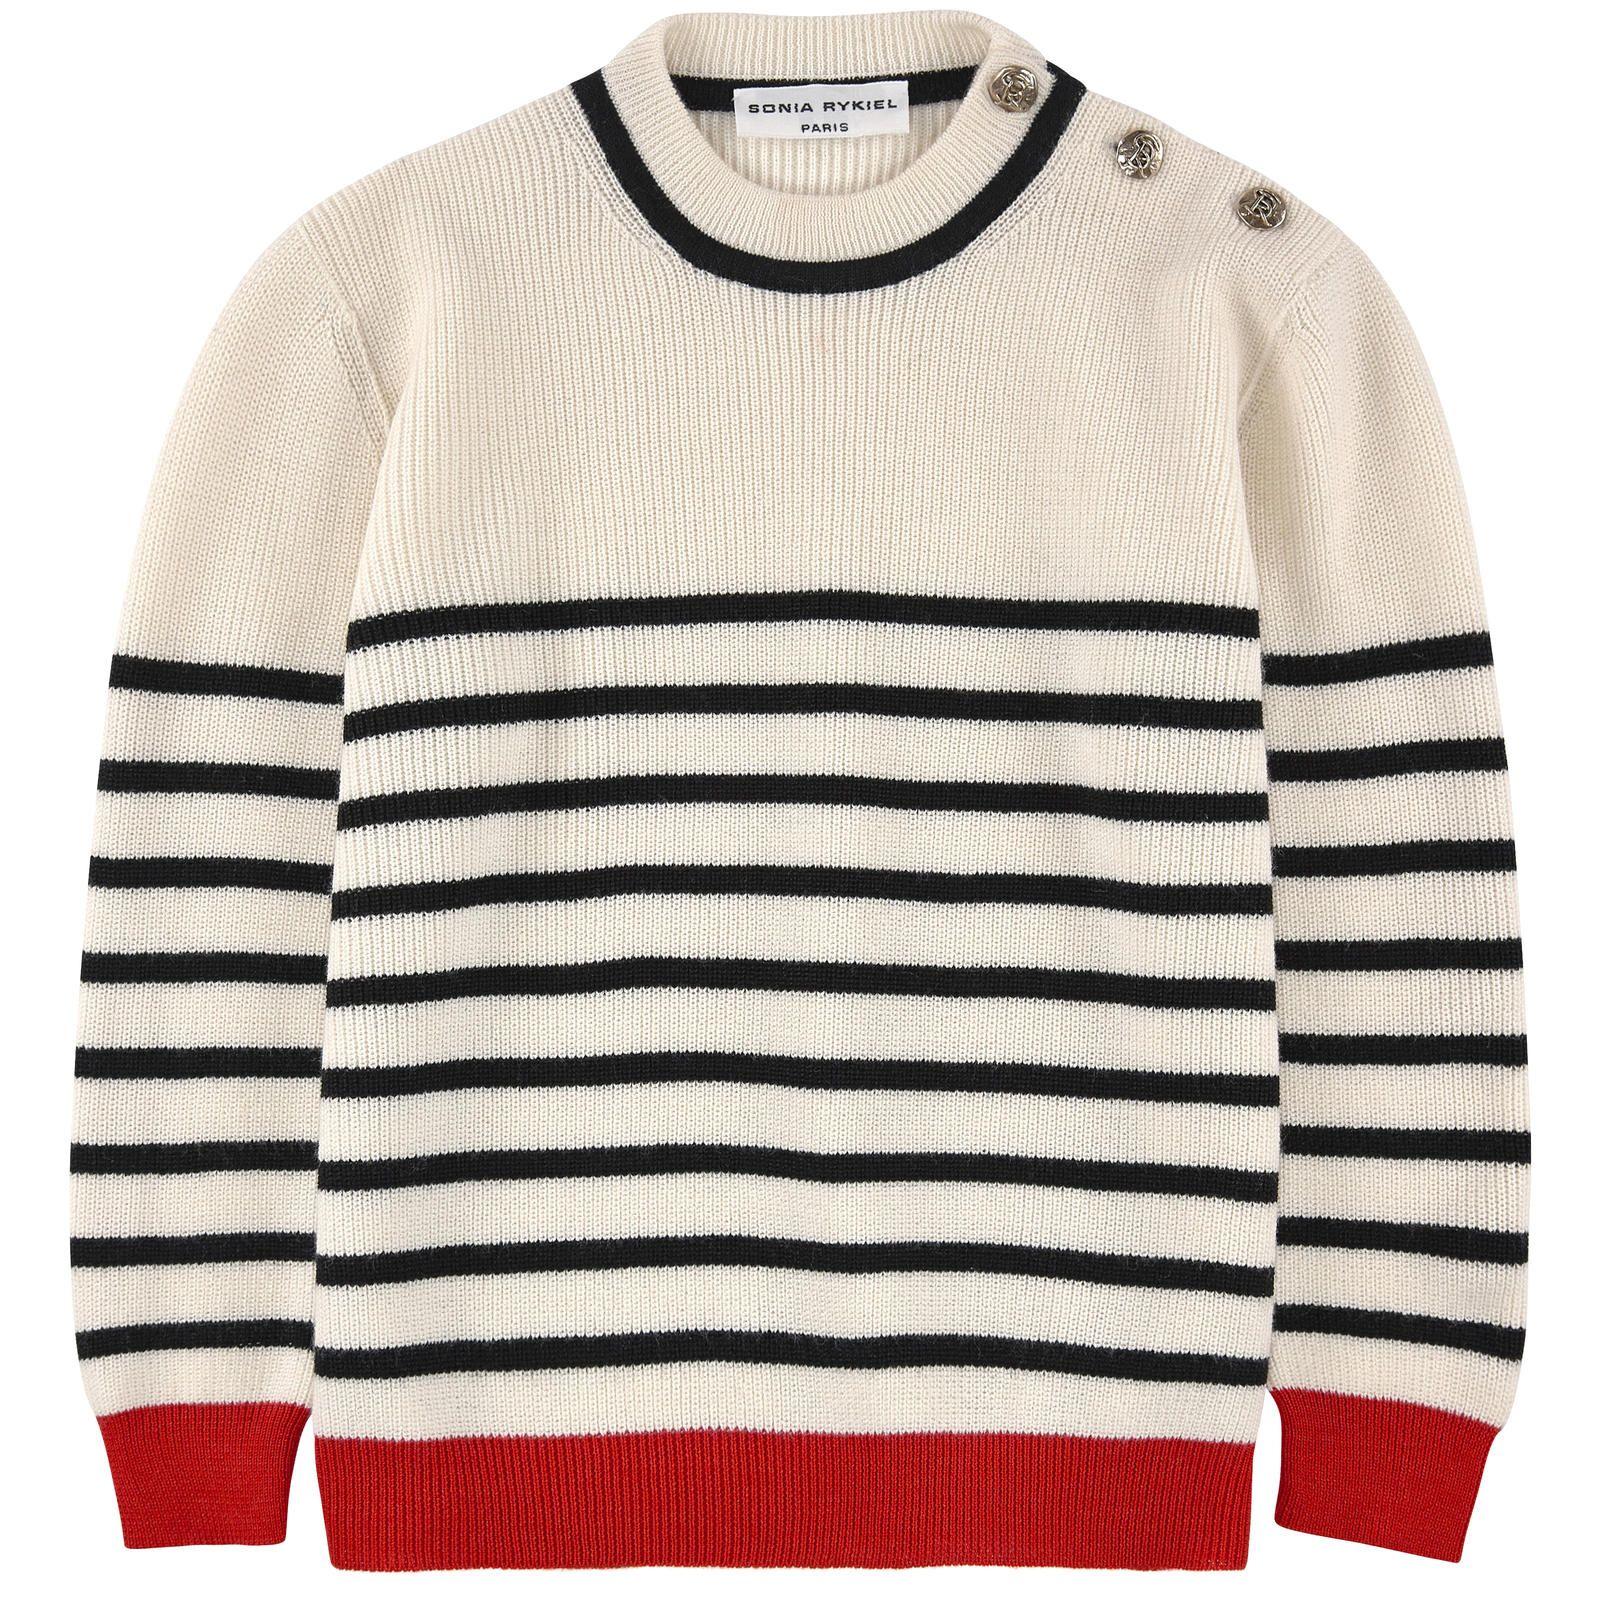 450e8e8b7c463a Sonia Rykiel Enfant Striped wool and cashmere knit sweater | Melijoe -  $186.50, orig. $373 // Love this!